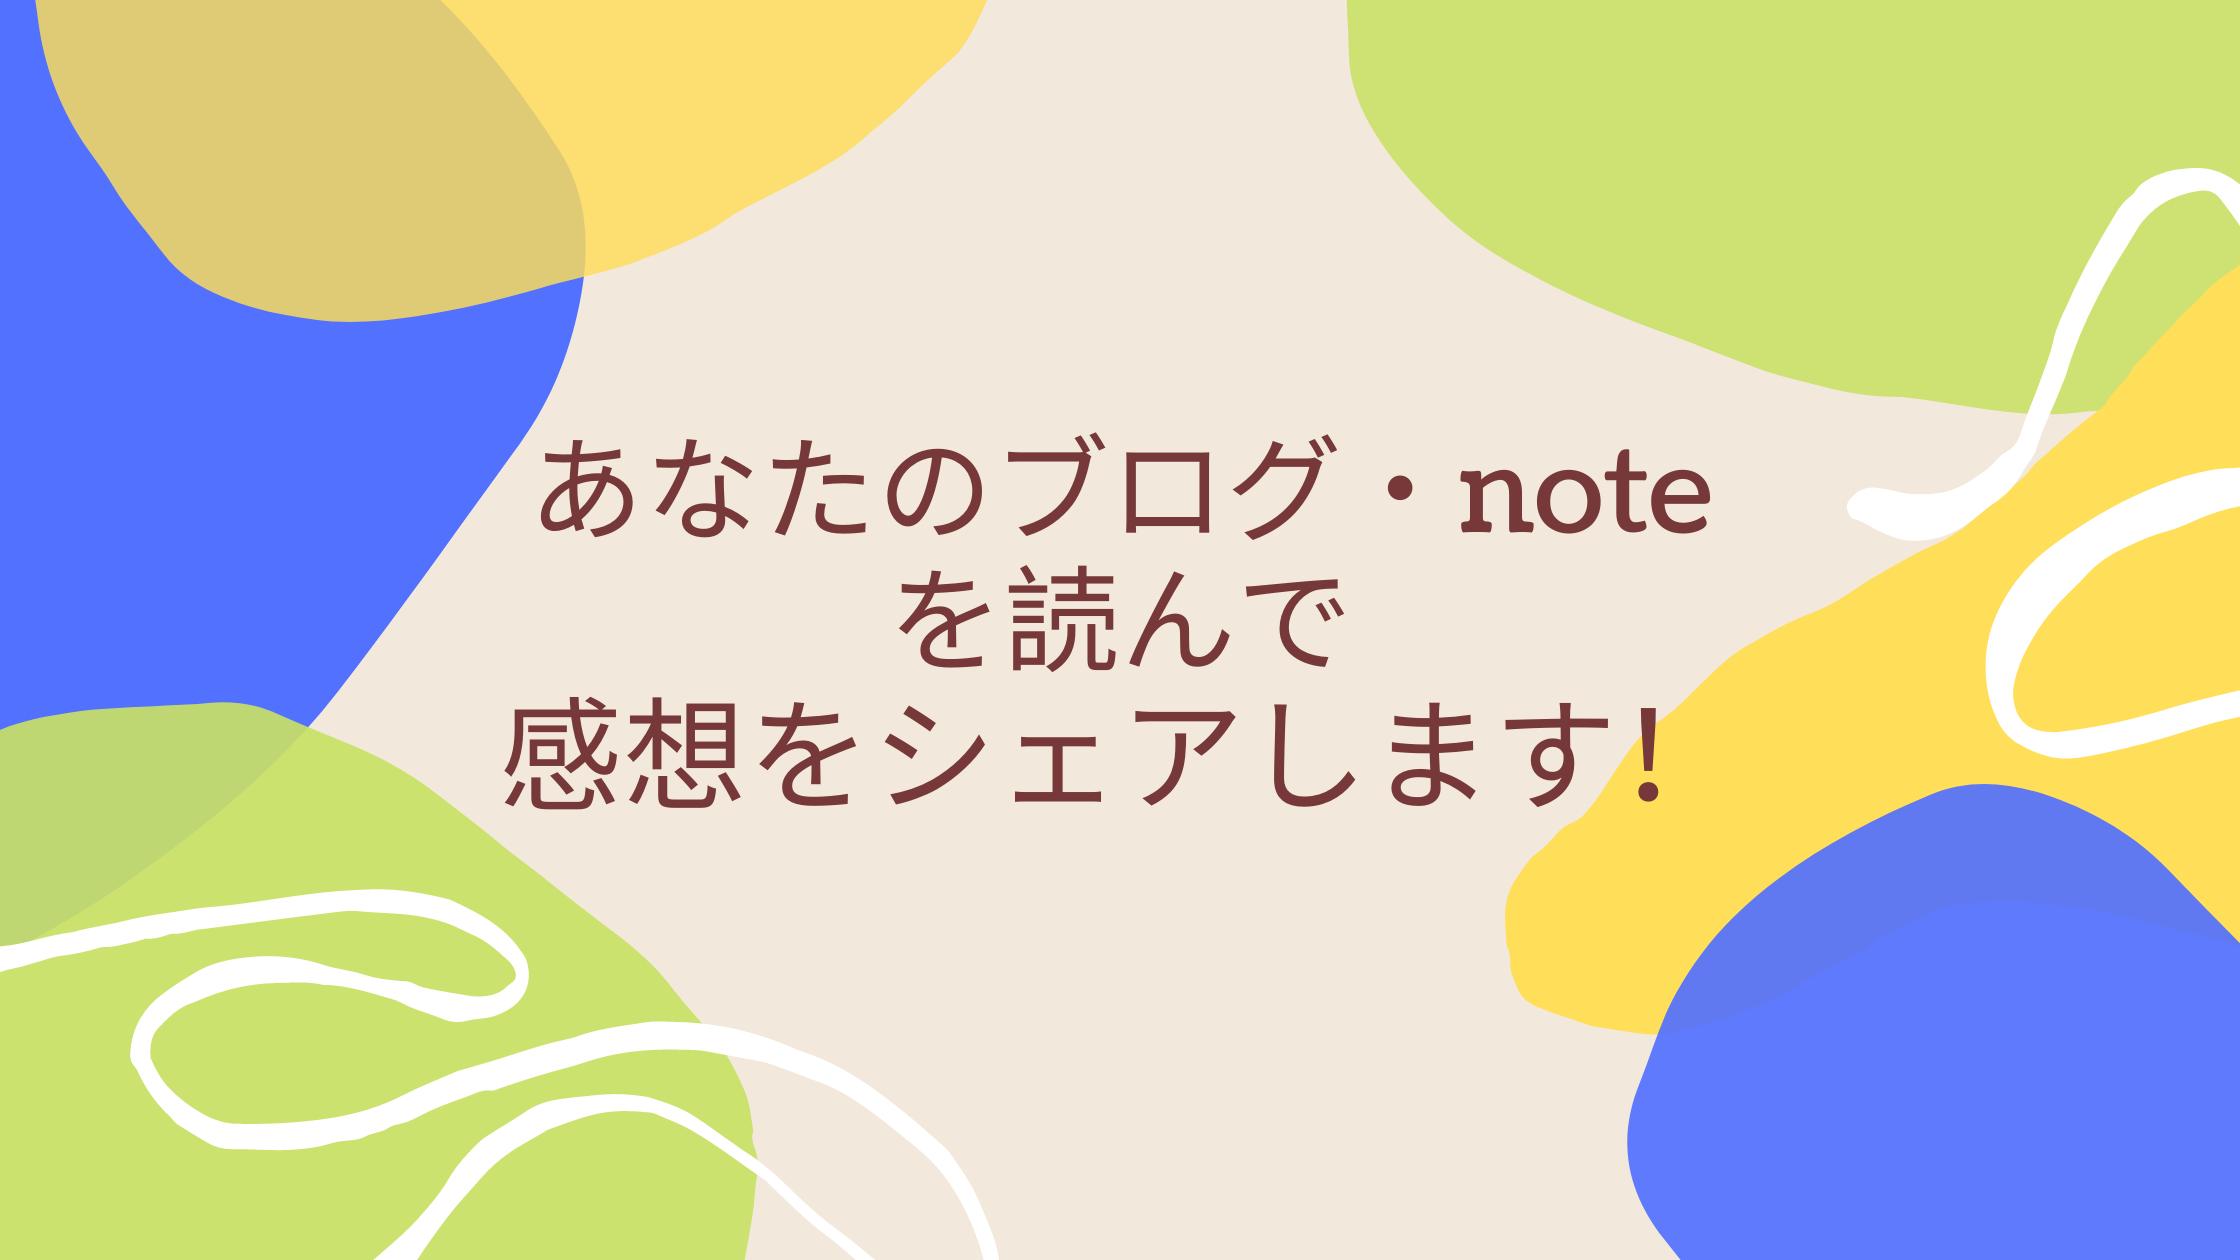 note・ブログを読んでシェアします!